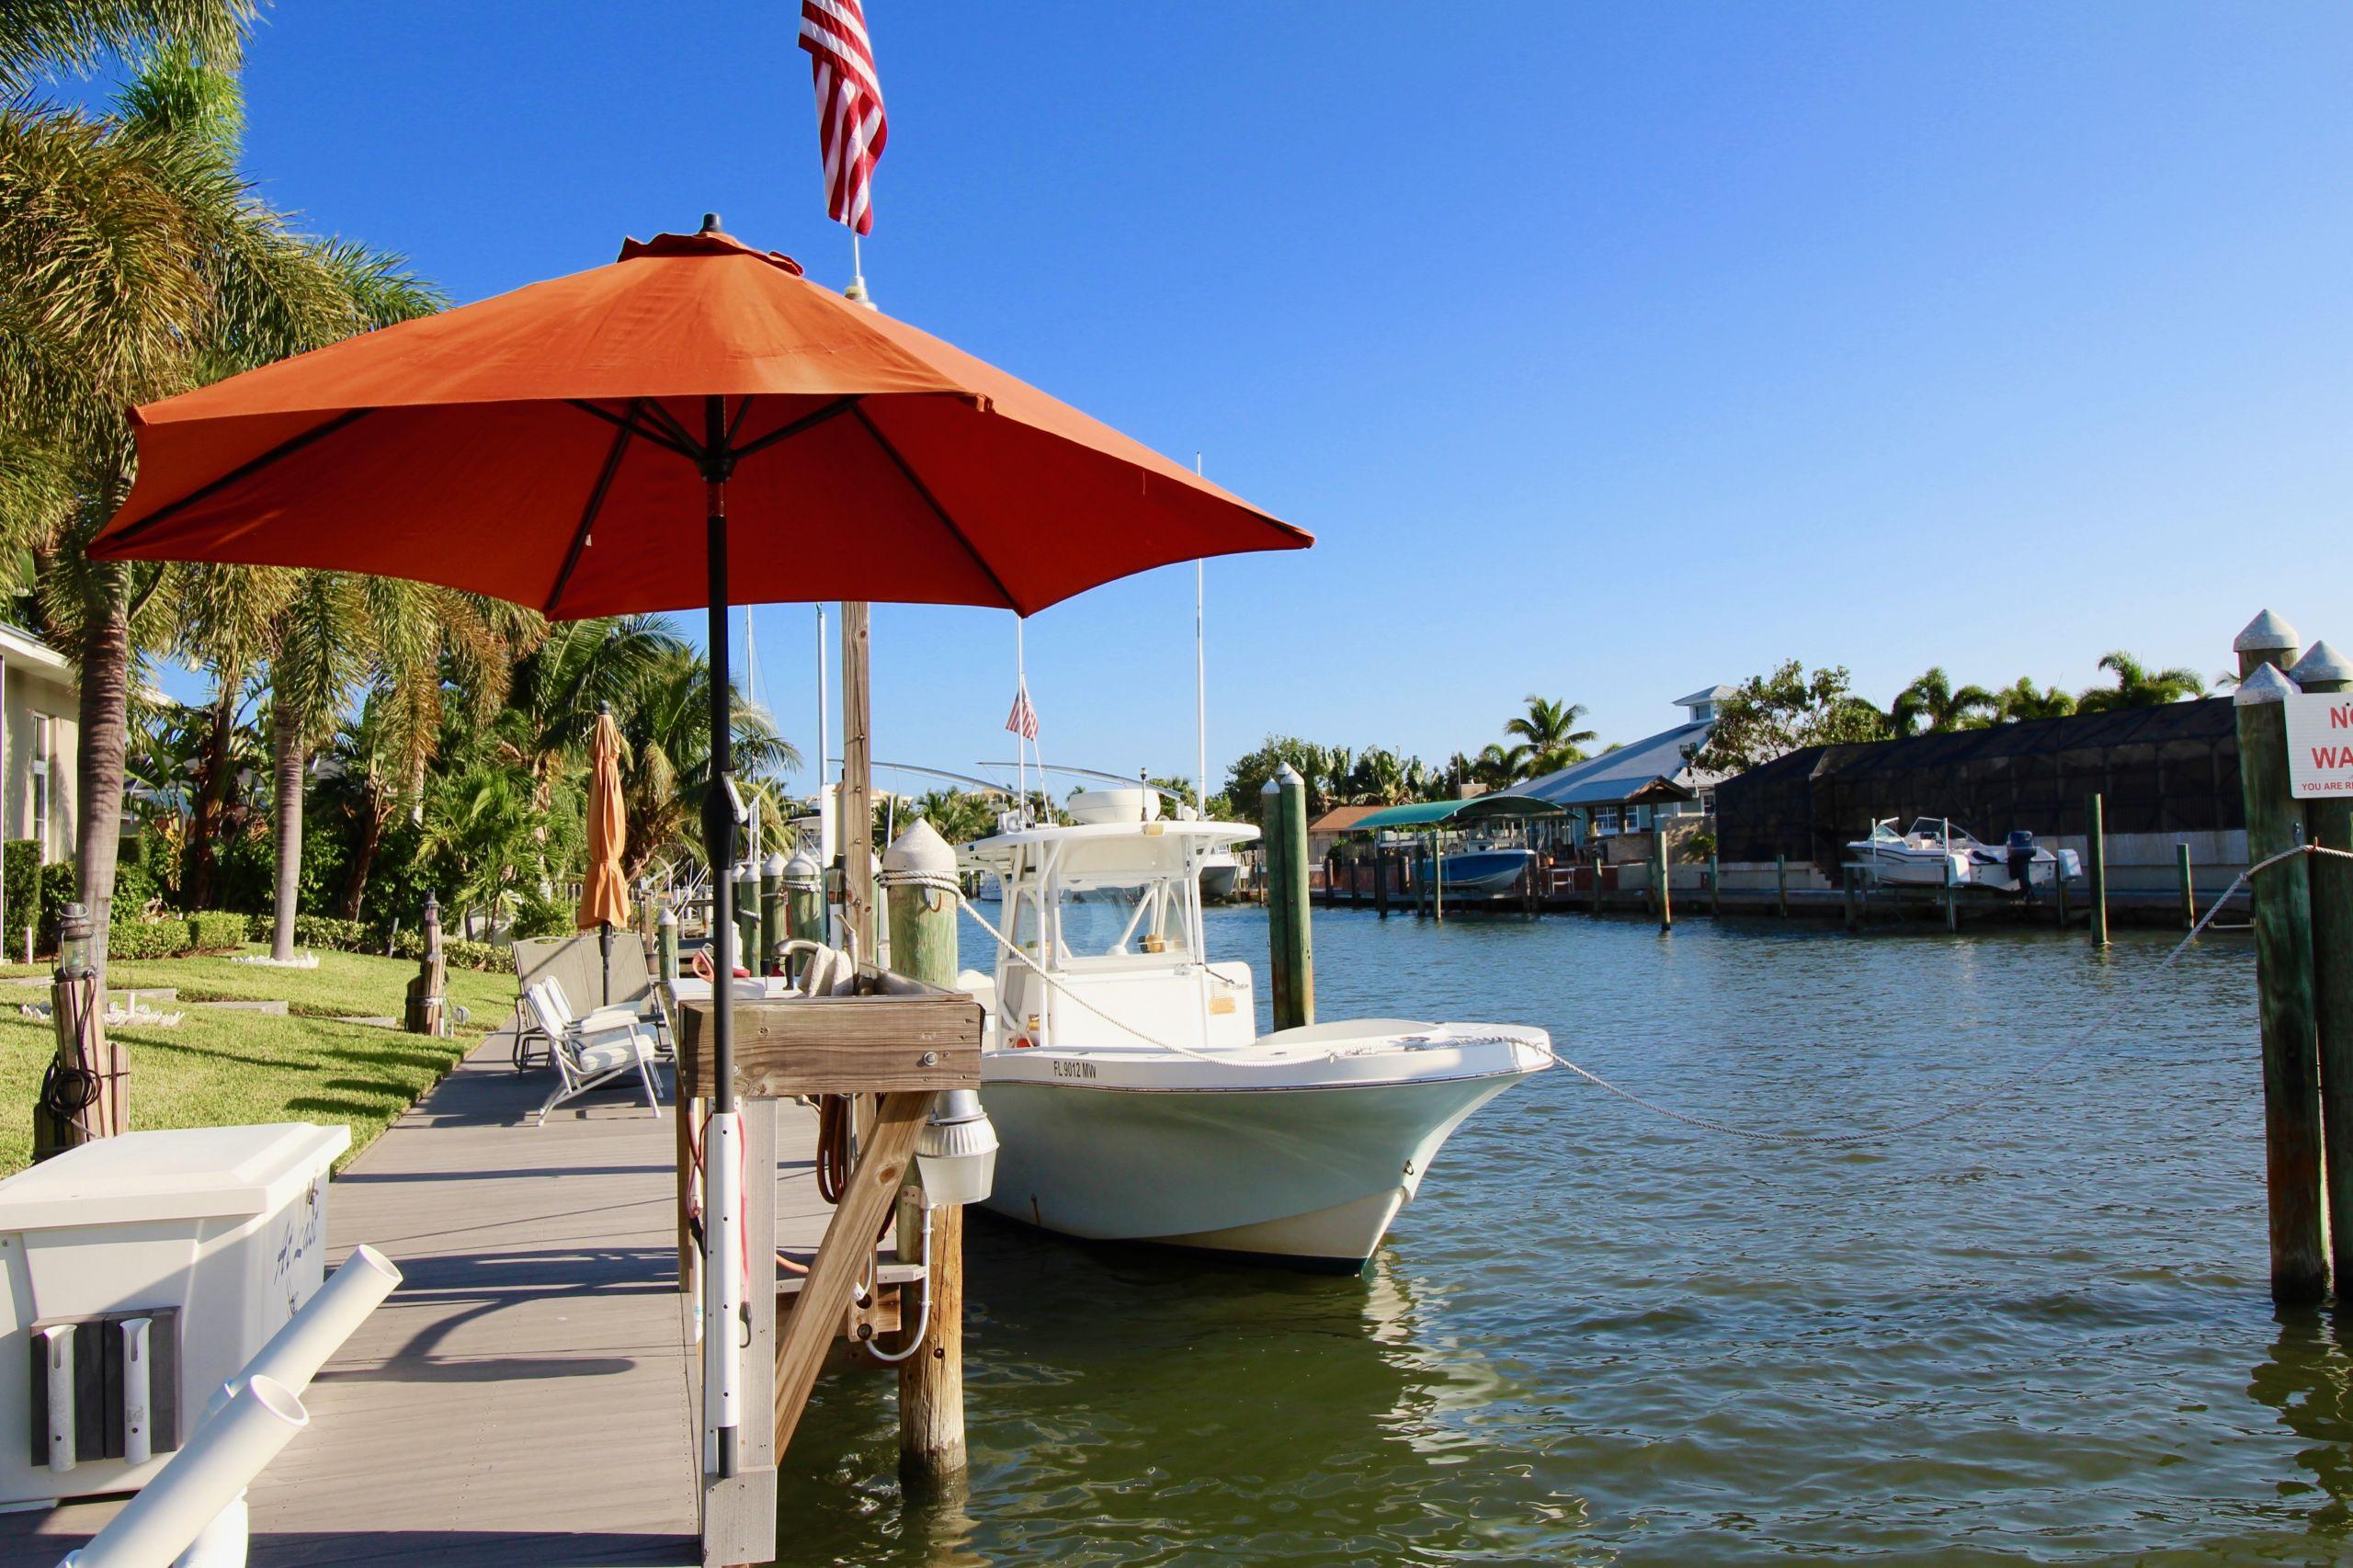 Ocean Access from your Backyard!